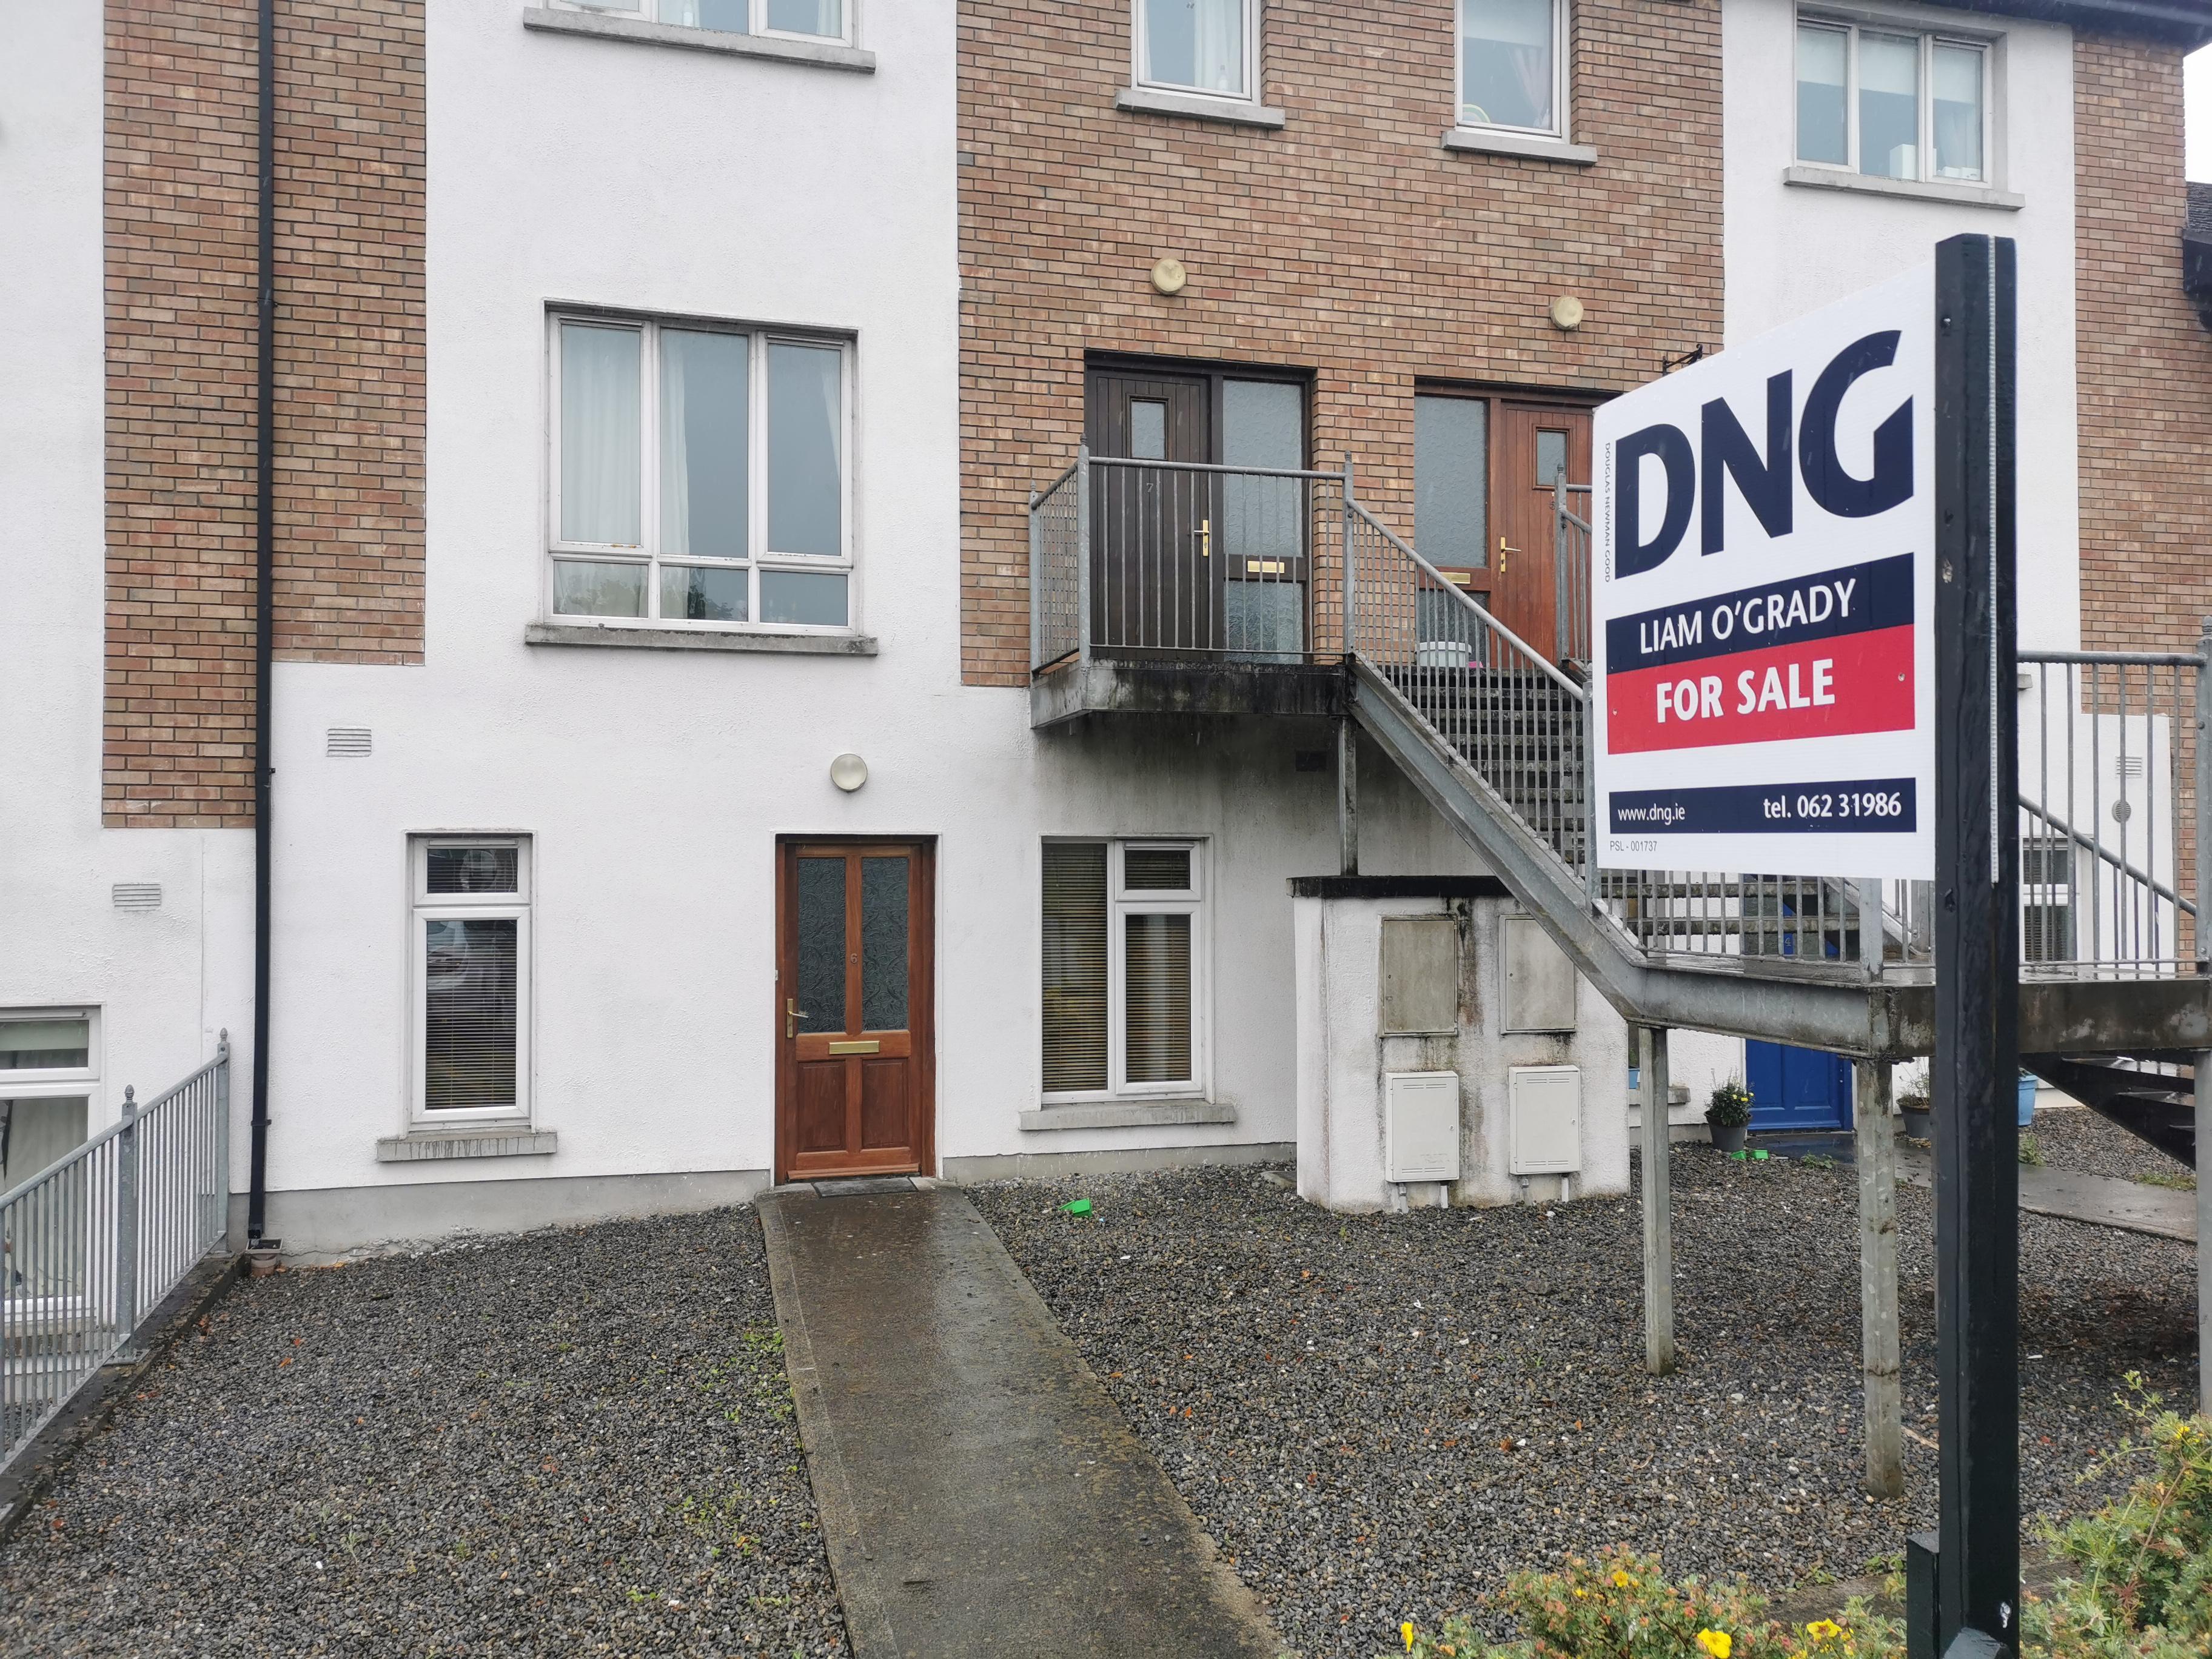 6 Arravale Close, Galbally Road, Tipperary Town E34 CK64